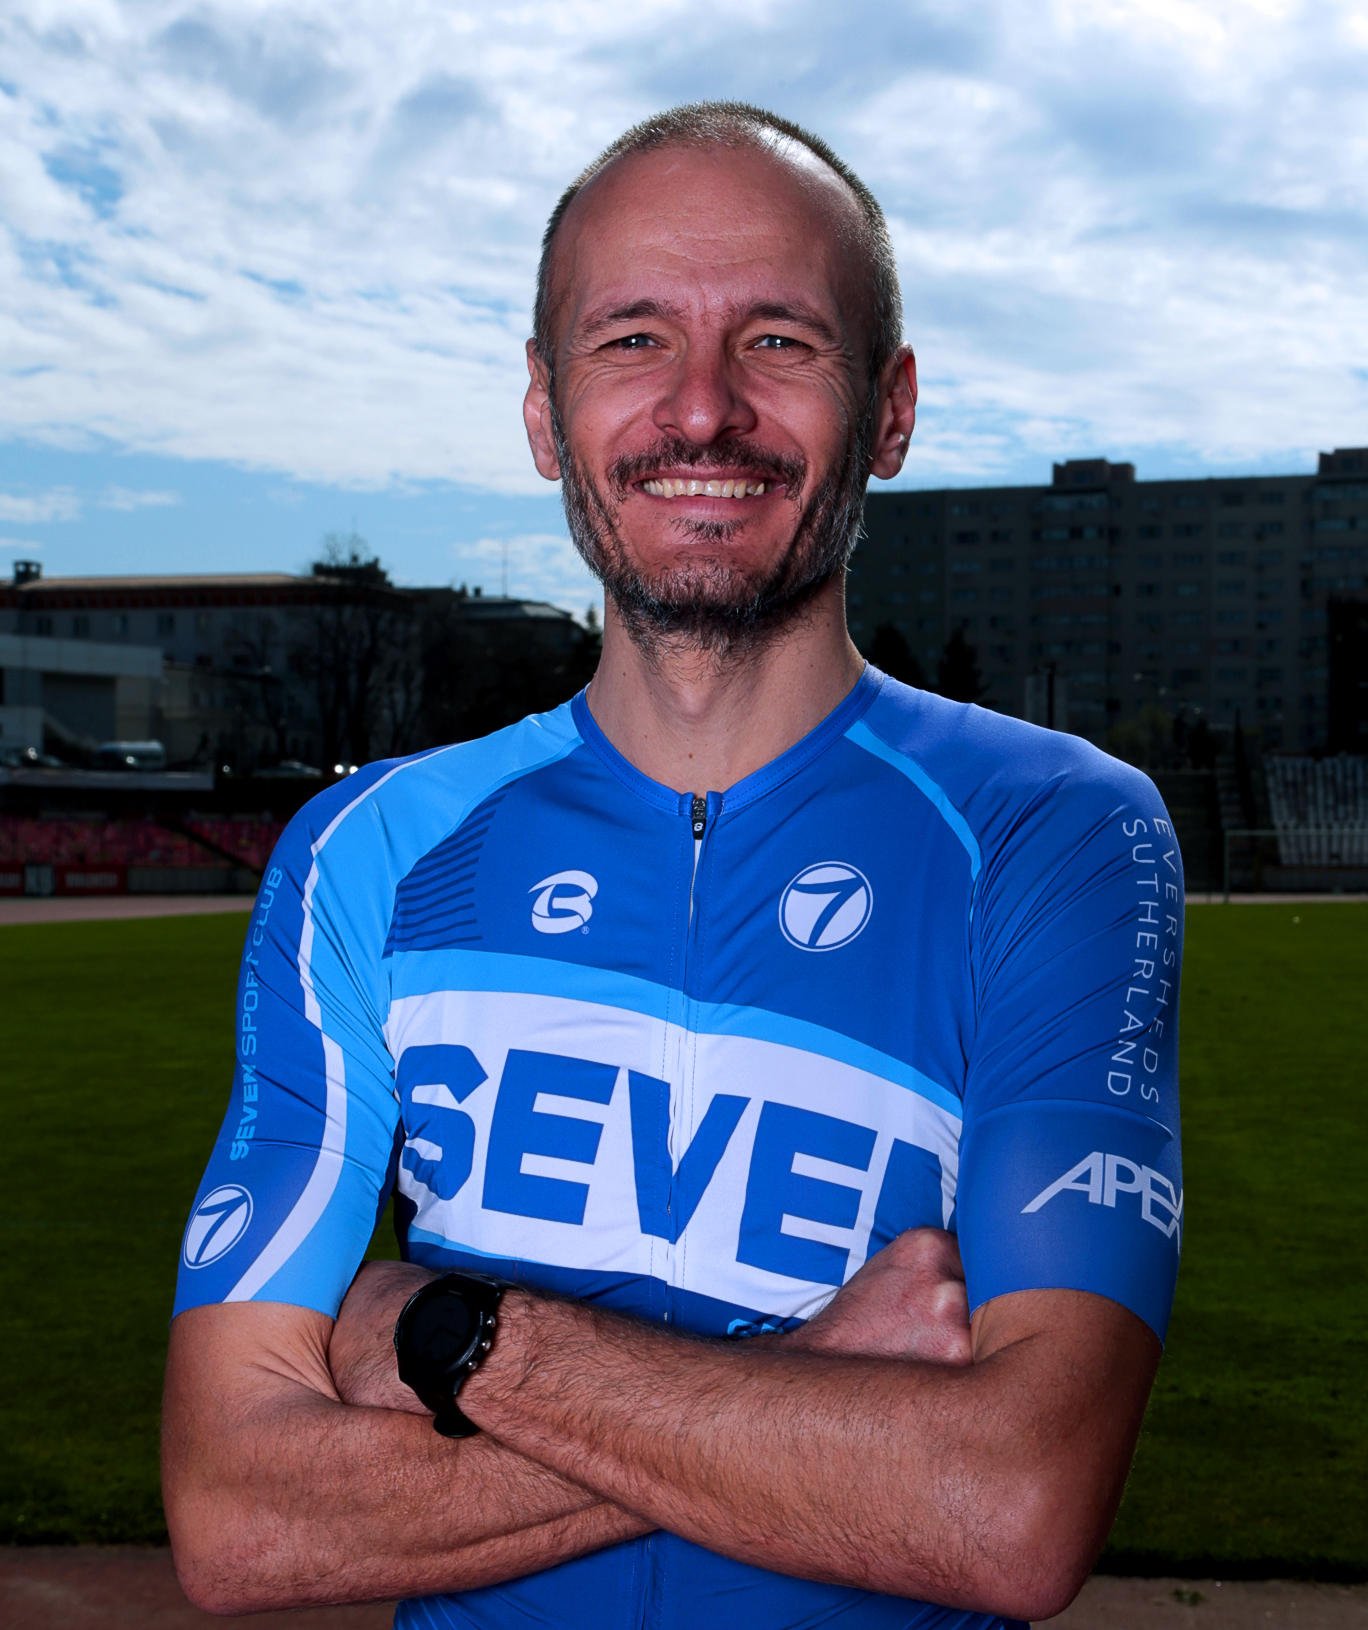 https://www.sevensportclub.ro/wp-content/uploads/2020/10/Antrenori_684x815_Alex.jpg